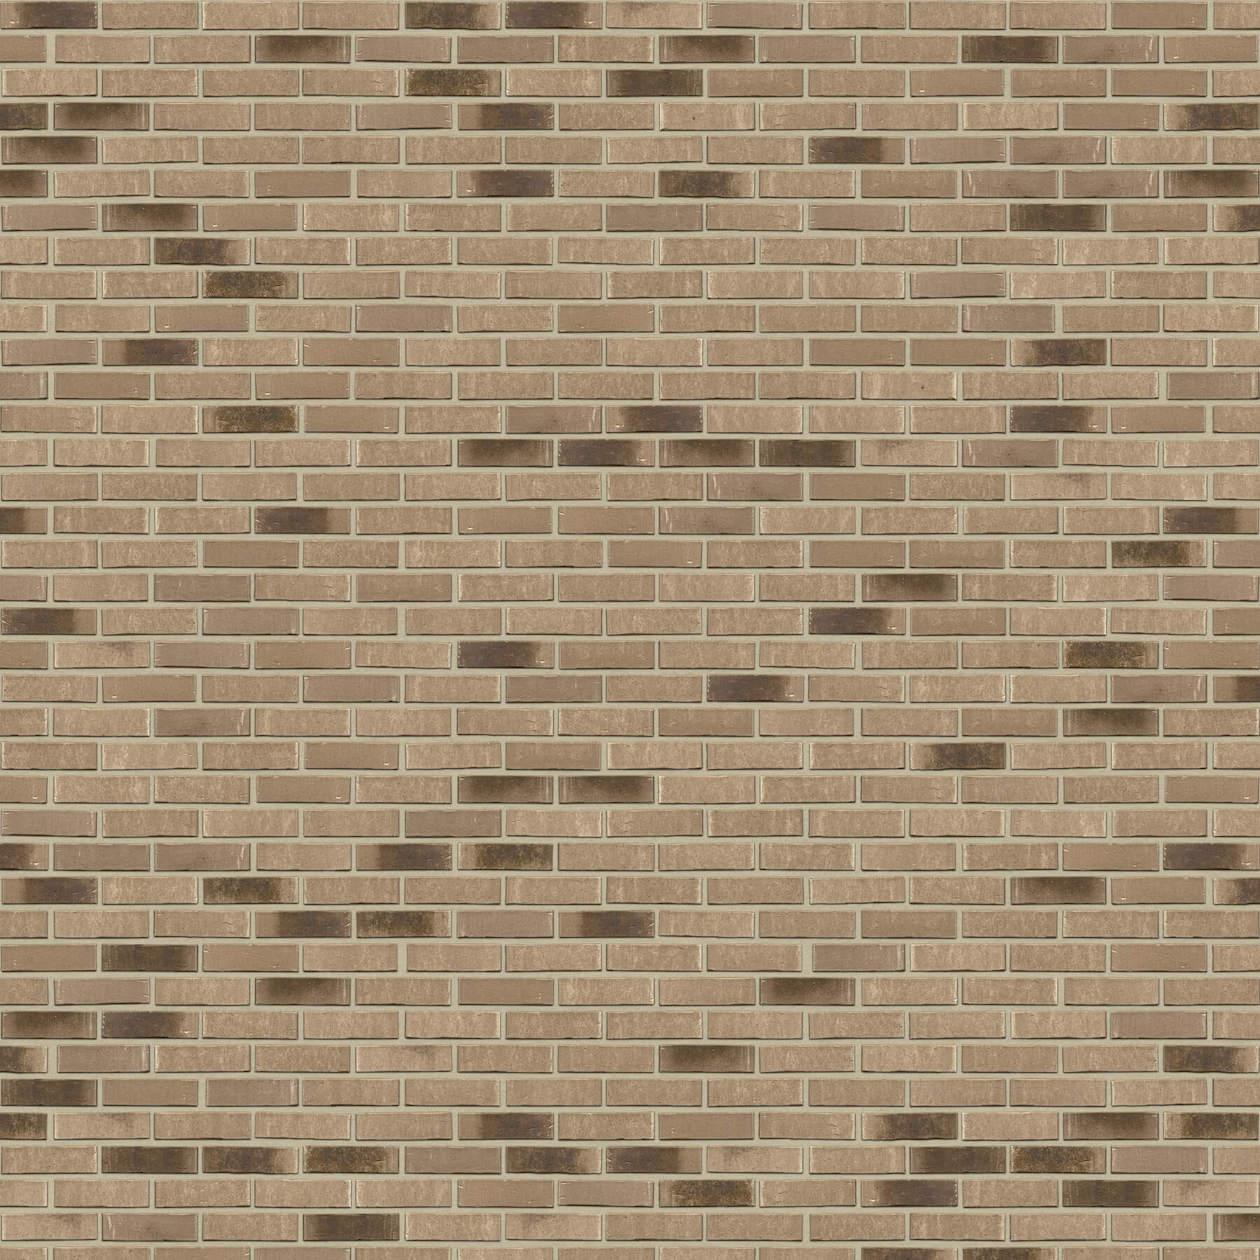 Puna-cigla-FeldHaus-Klinker-brick-house-nf-k-764-Bez Fuga